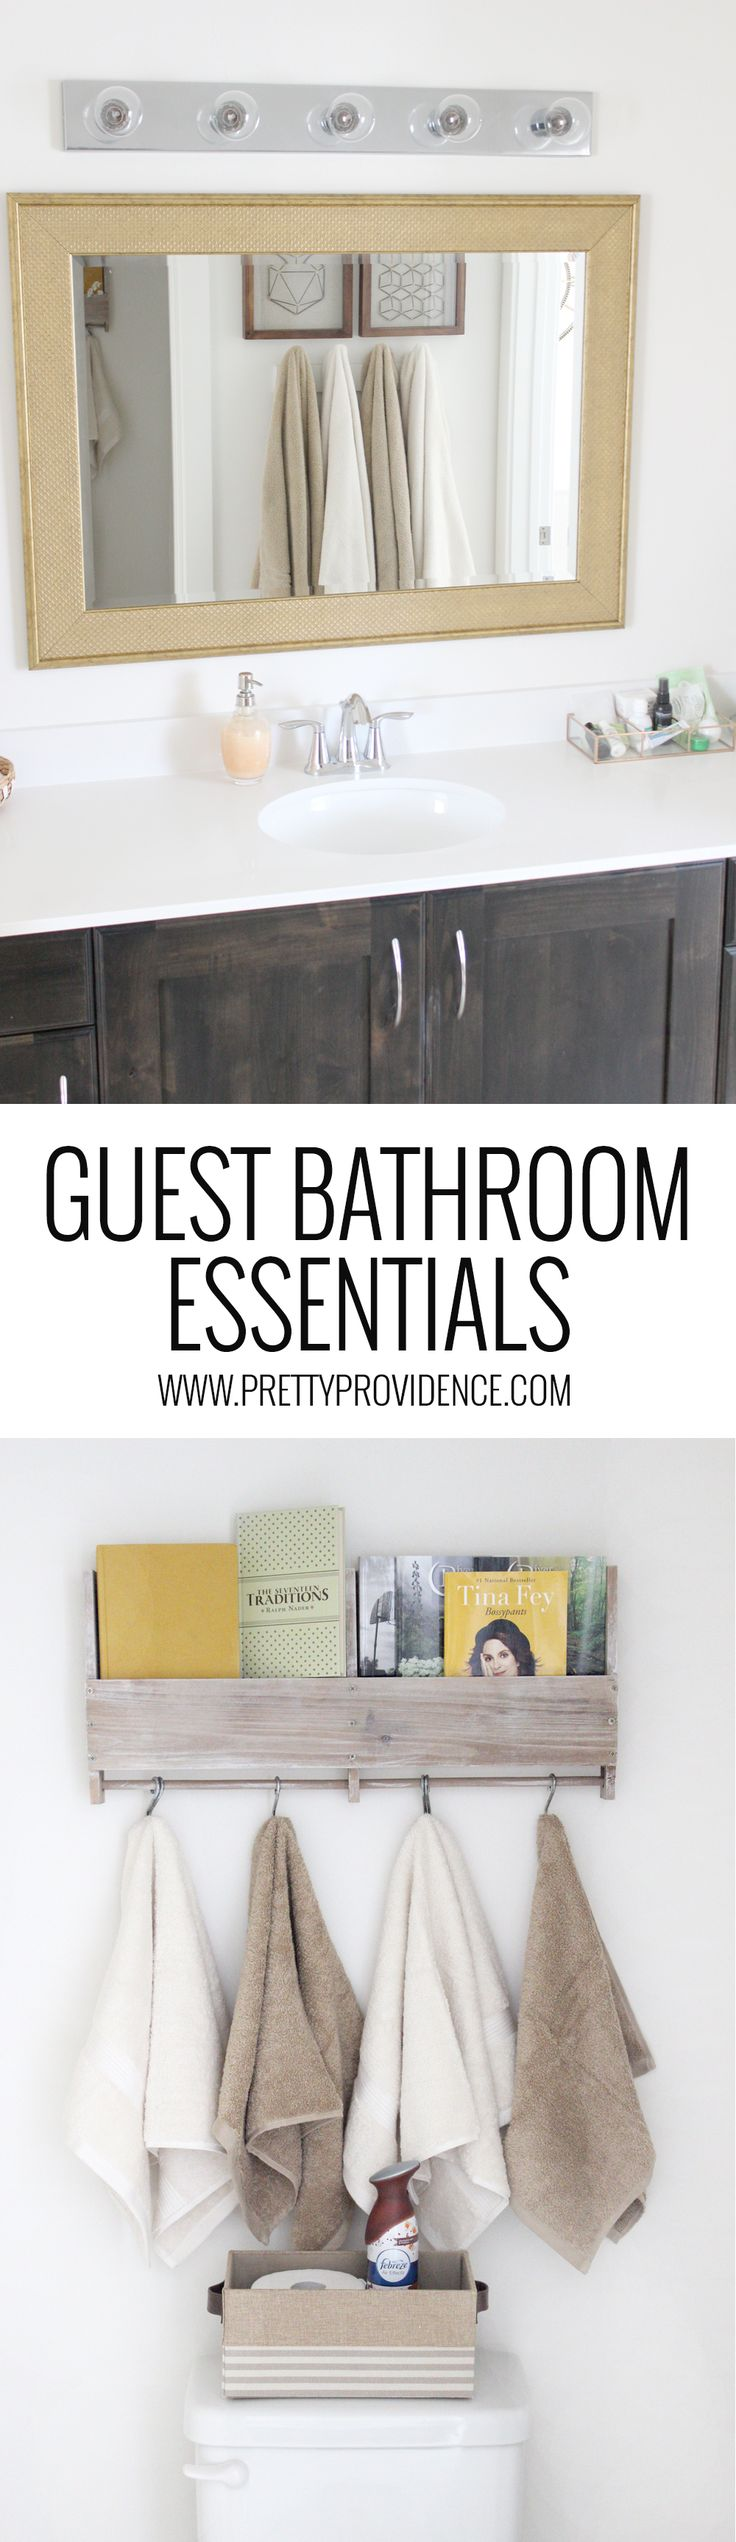 Guest Bathroom Essentials. 1000  ideas about Bathroom Essentials on Pinterest   Dorm bathroom